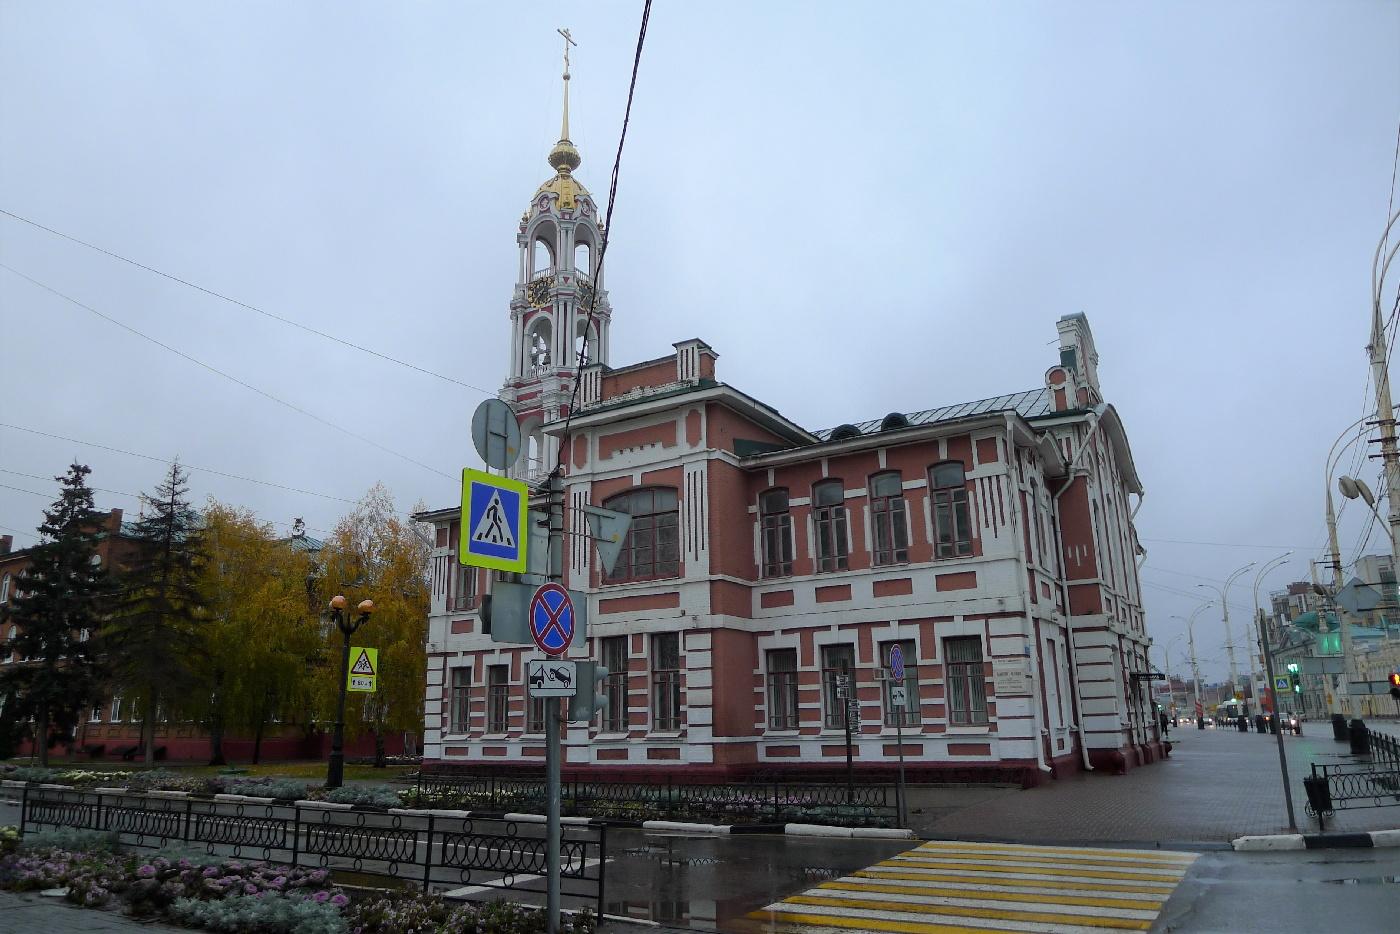 Русский Юг: Тамбов (Усадьба Асеевых, город) P1100384